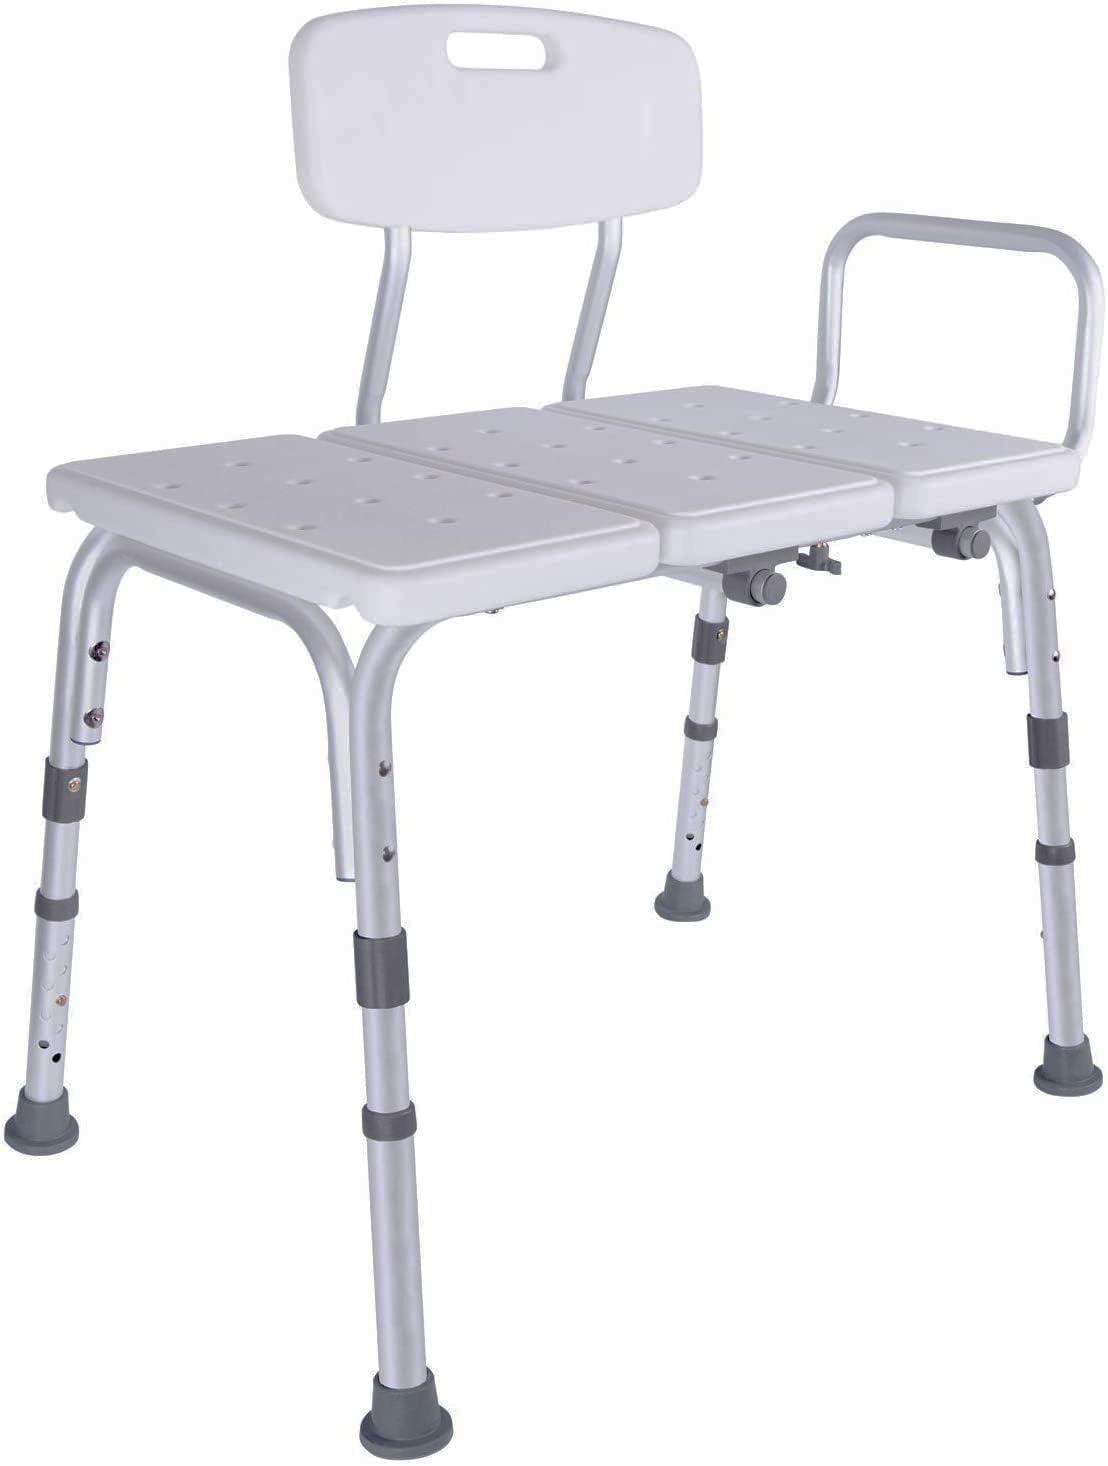 Vaunn Medical Shower Transfer Bench, Bathtub Seat, Shower Chair